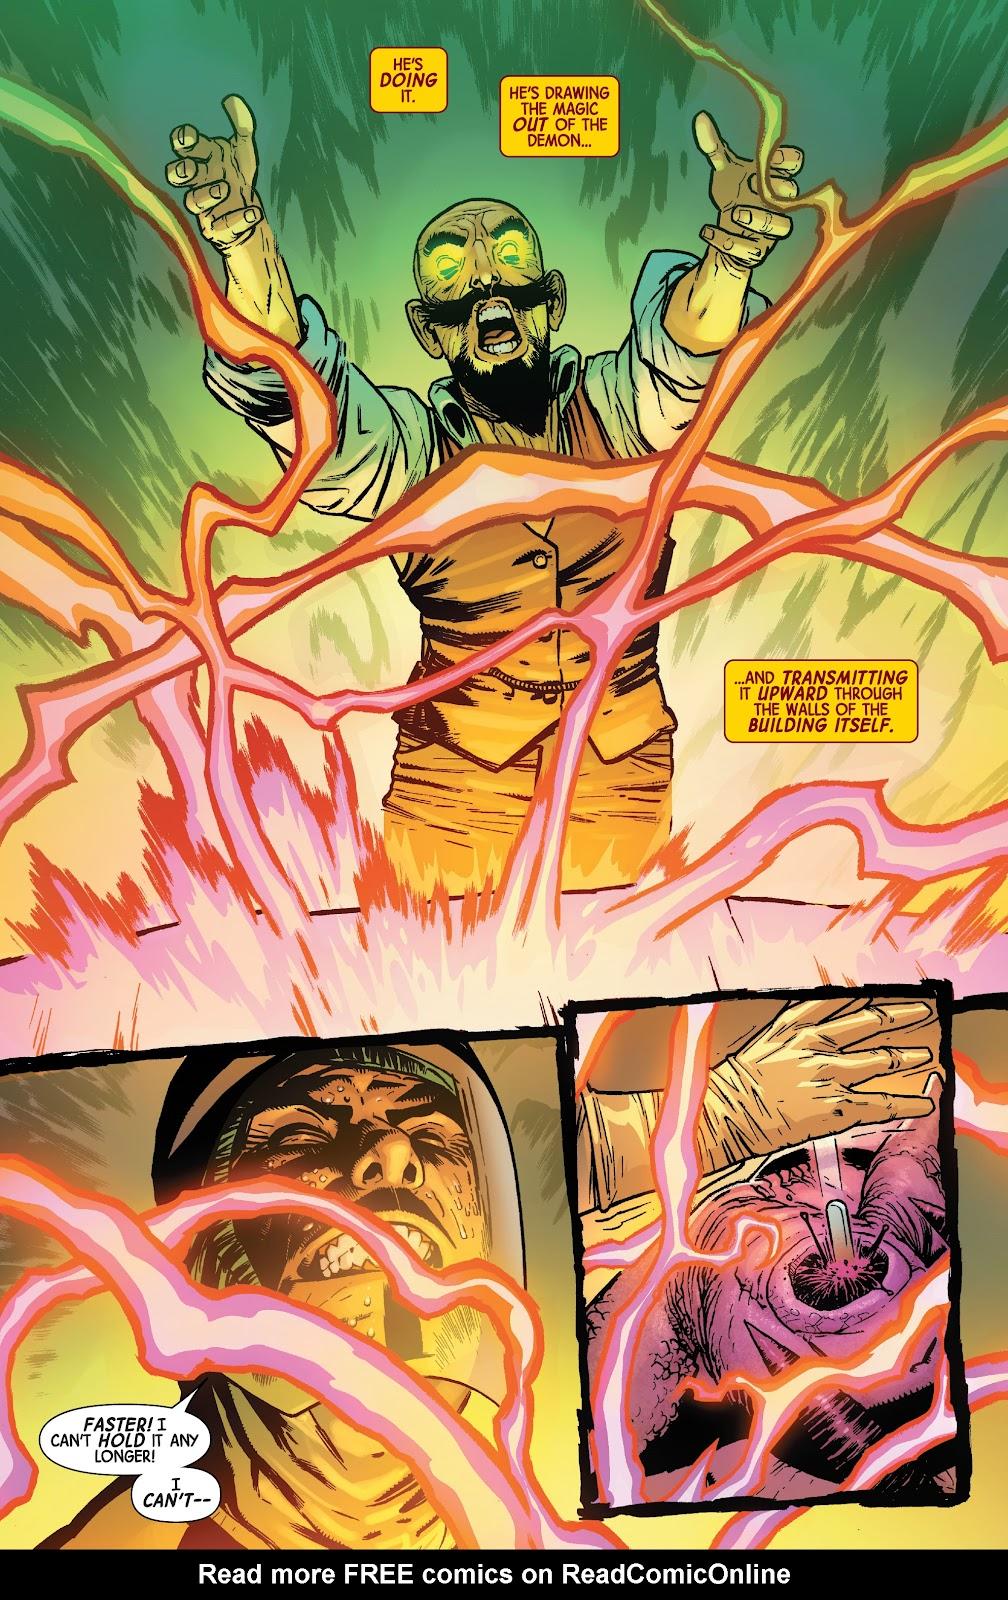 Read online Dr. Strange comic -  Issue #4 - 18